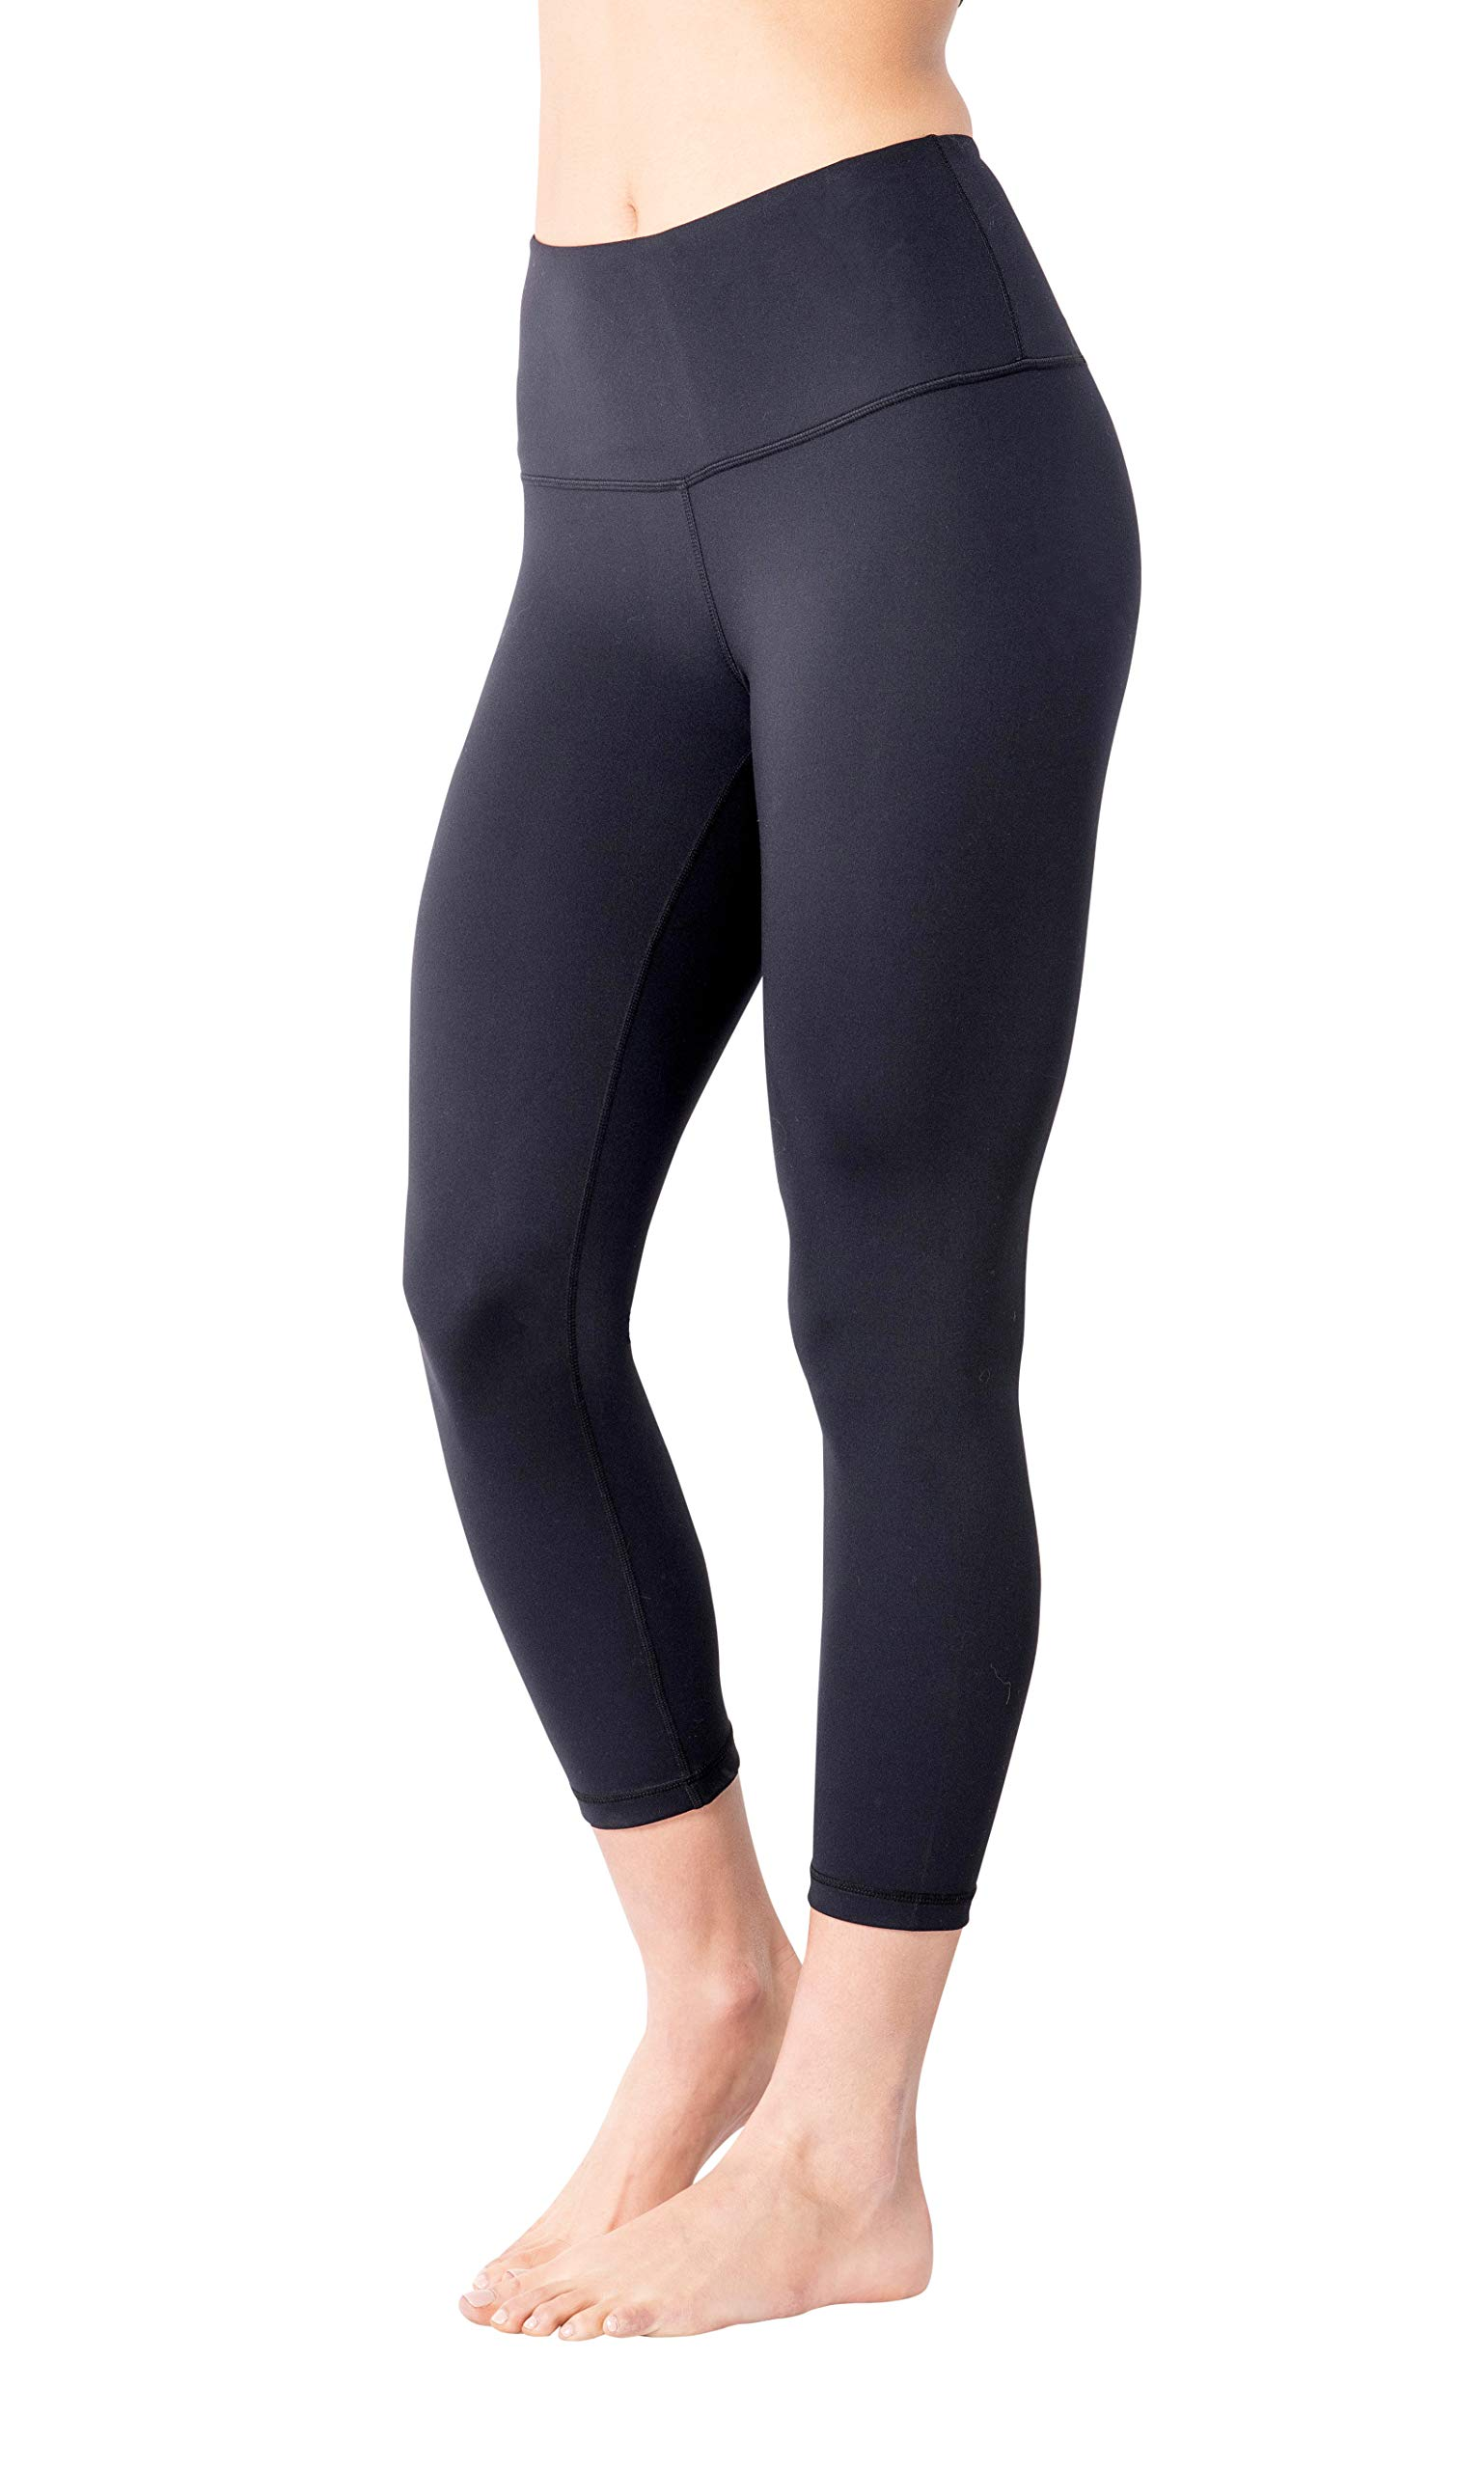 Yogalicious High Waist Ultra Soft Lightweight Capris - High Rise Yoga Pants - Classic Black - XS